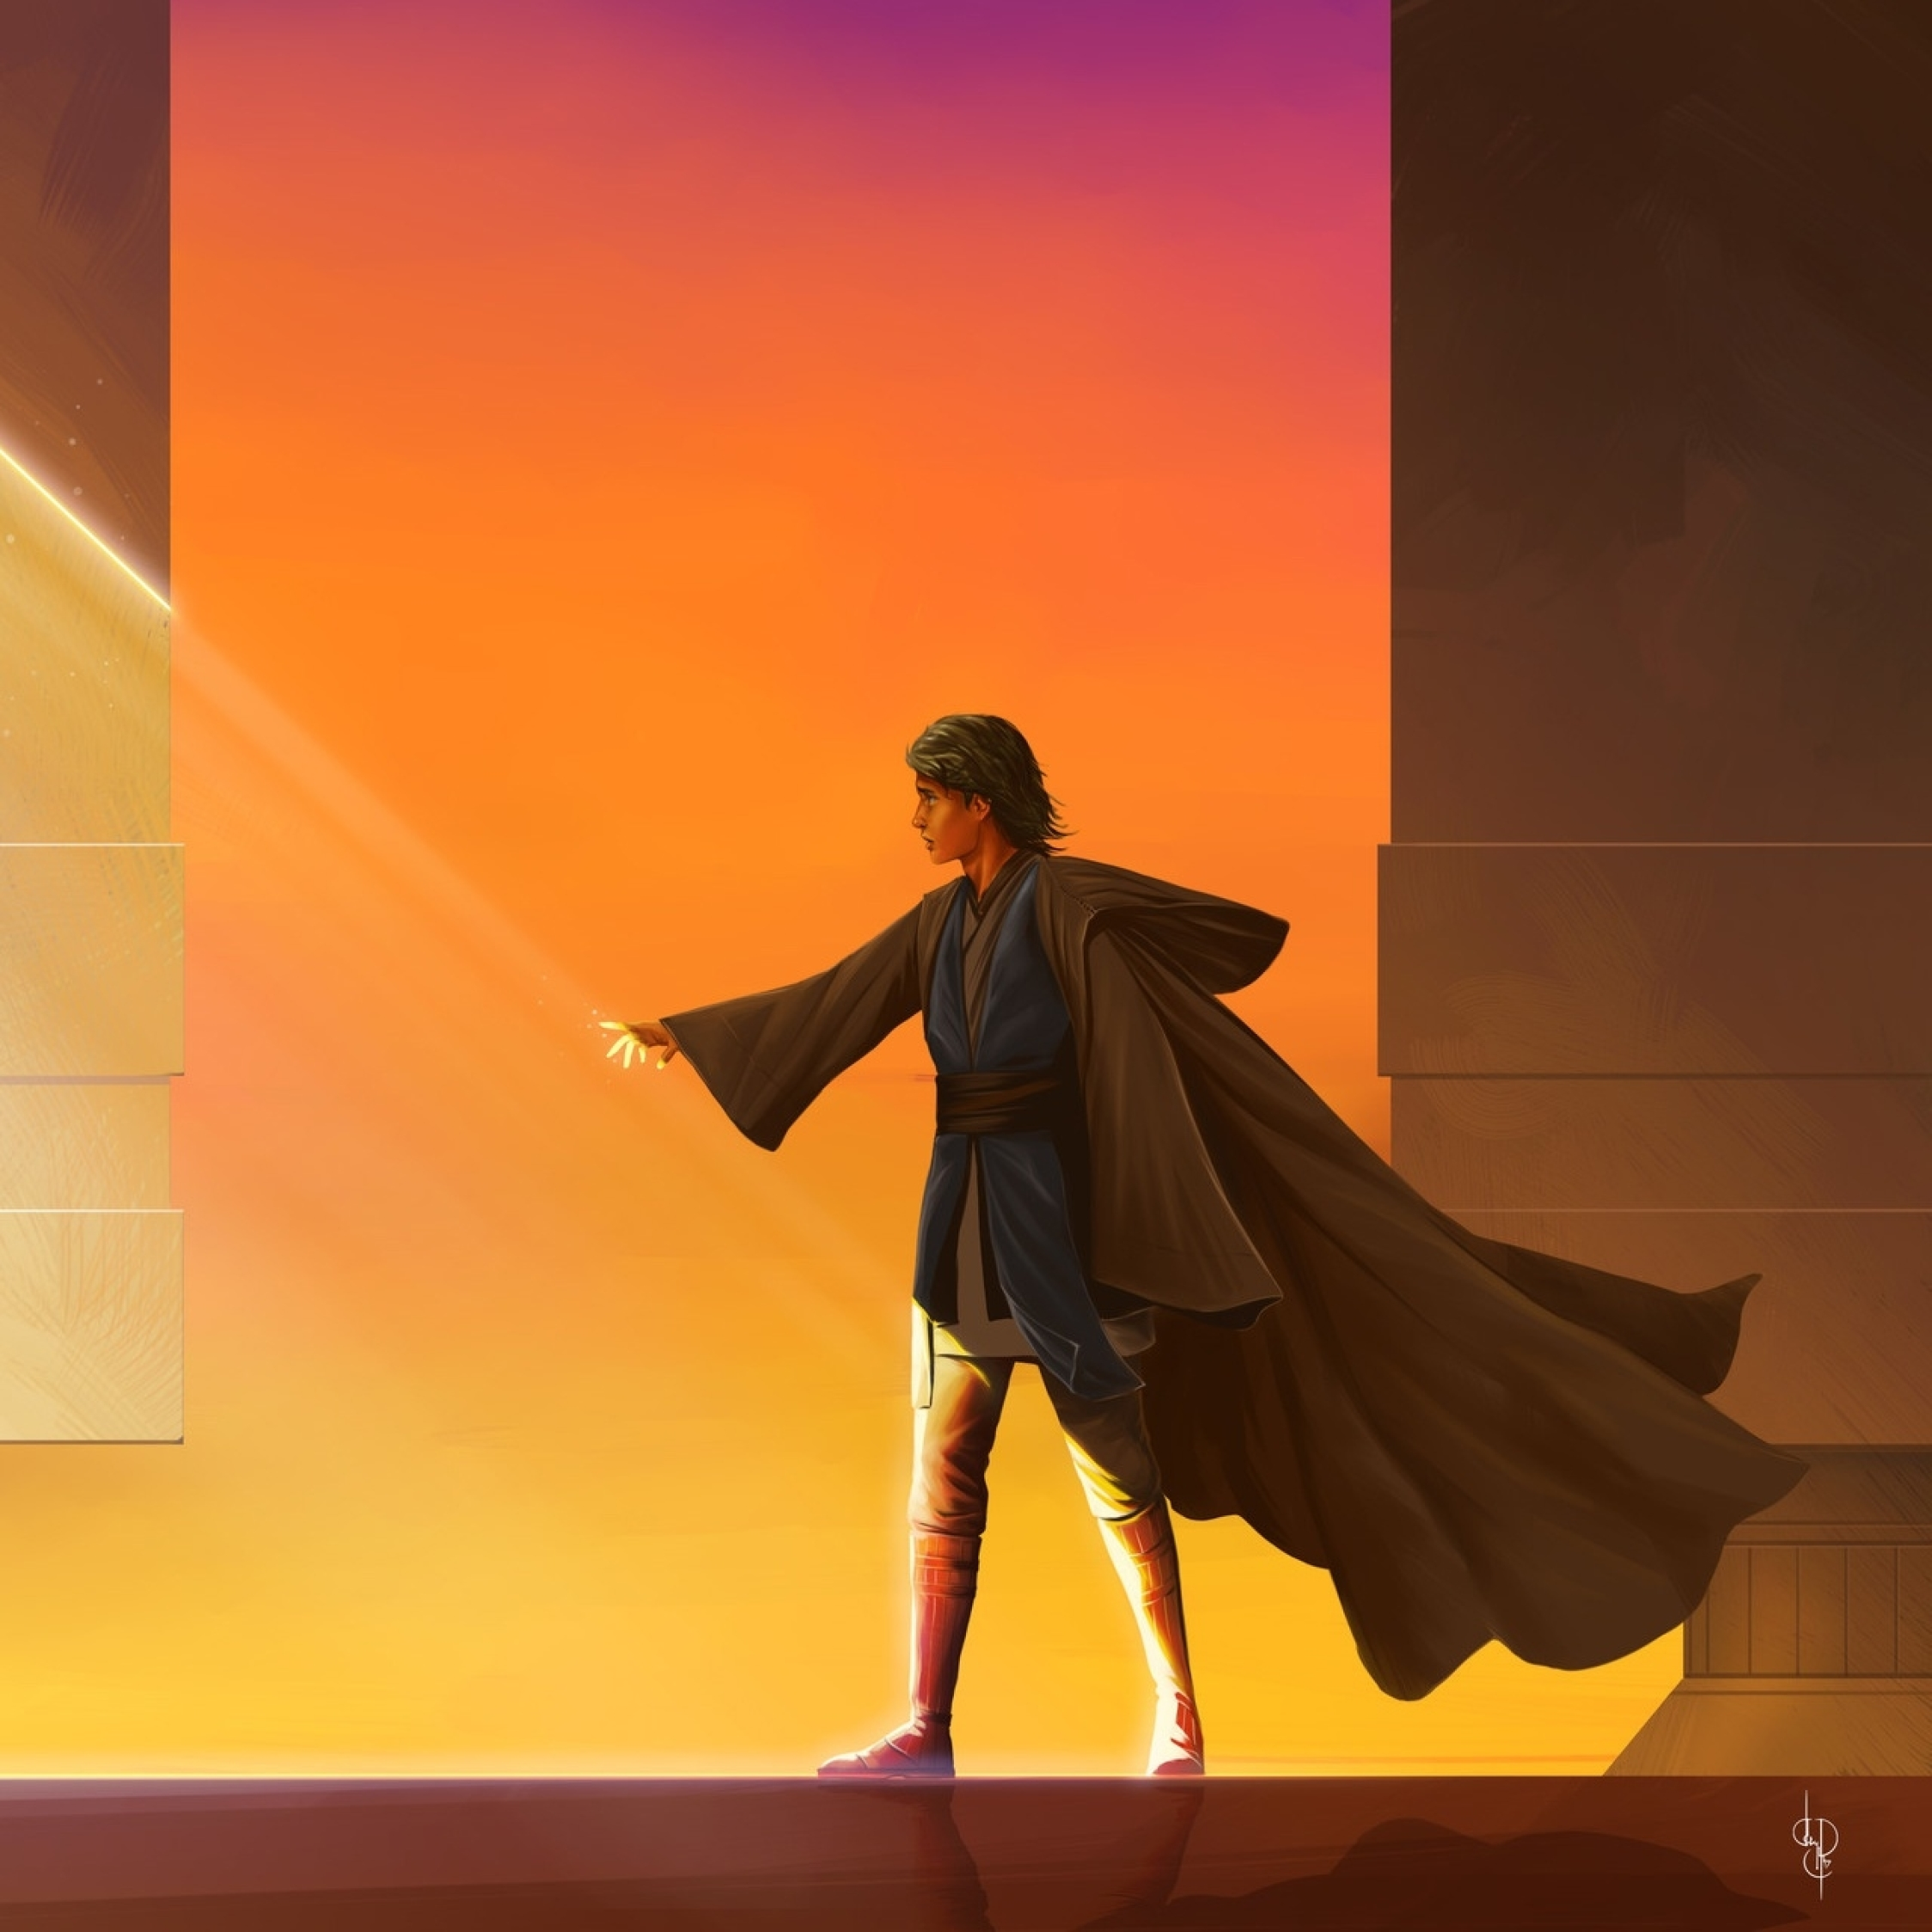 2248x2248 Ahsoka Tano and Anakin Skywalker Art 2248x2248